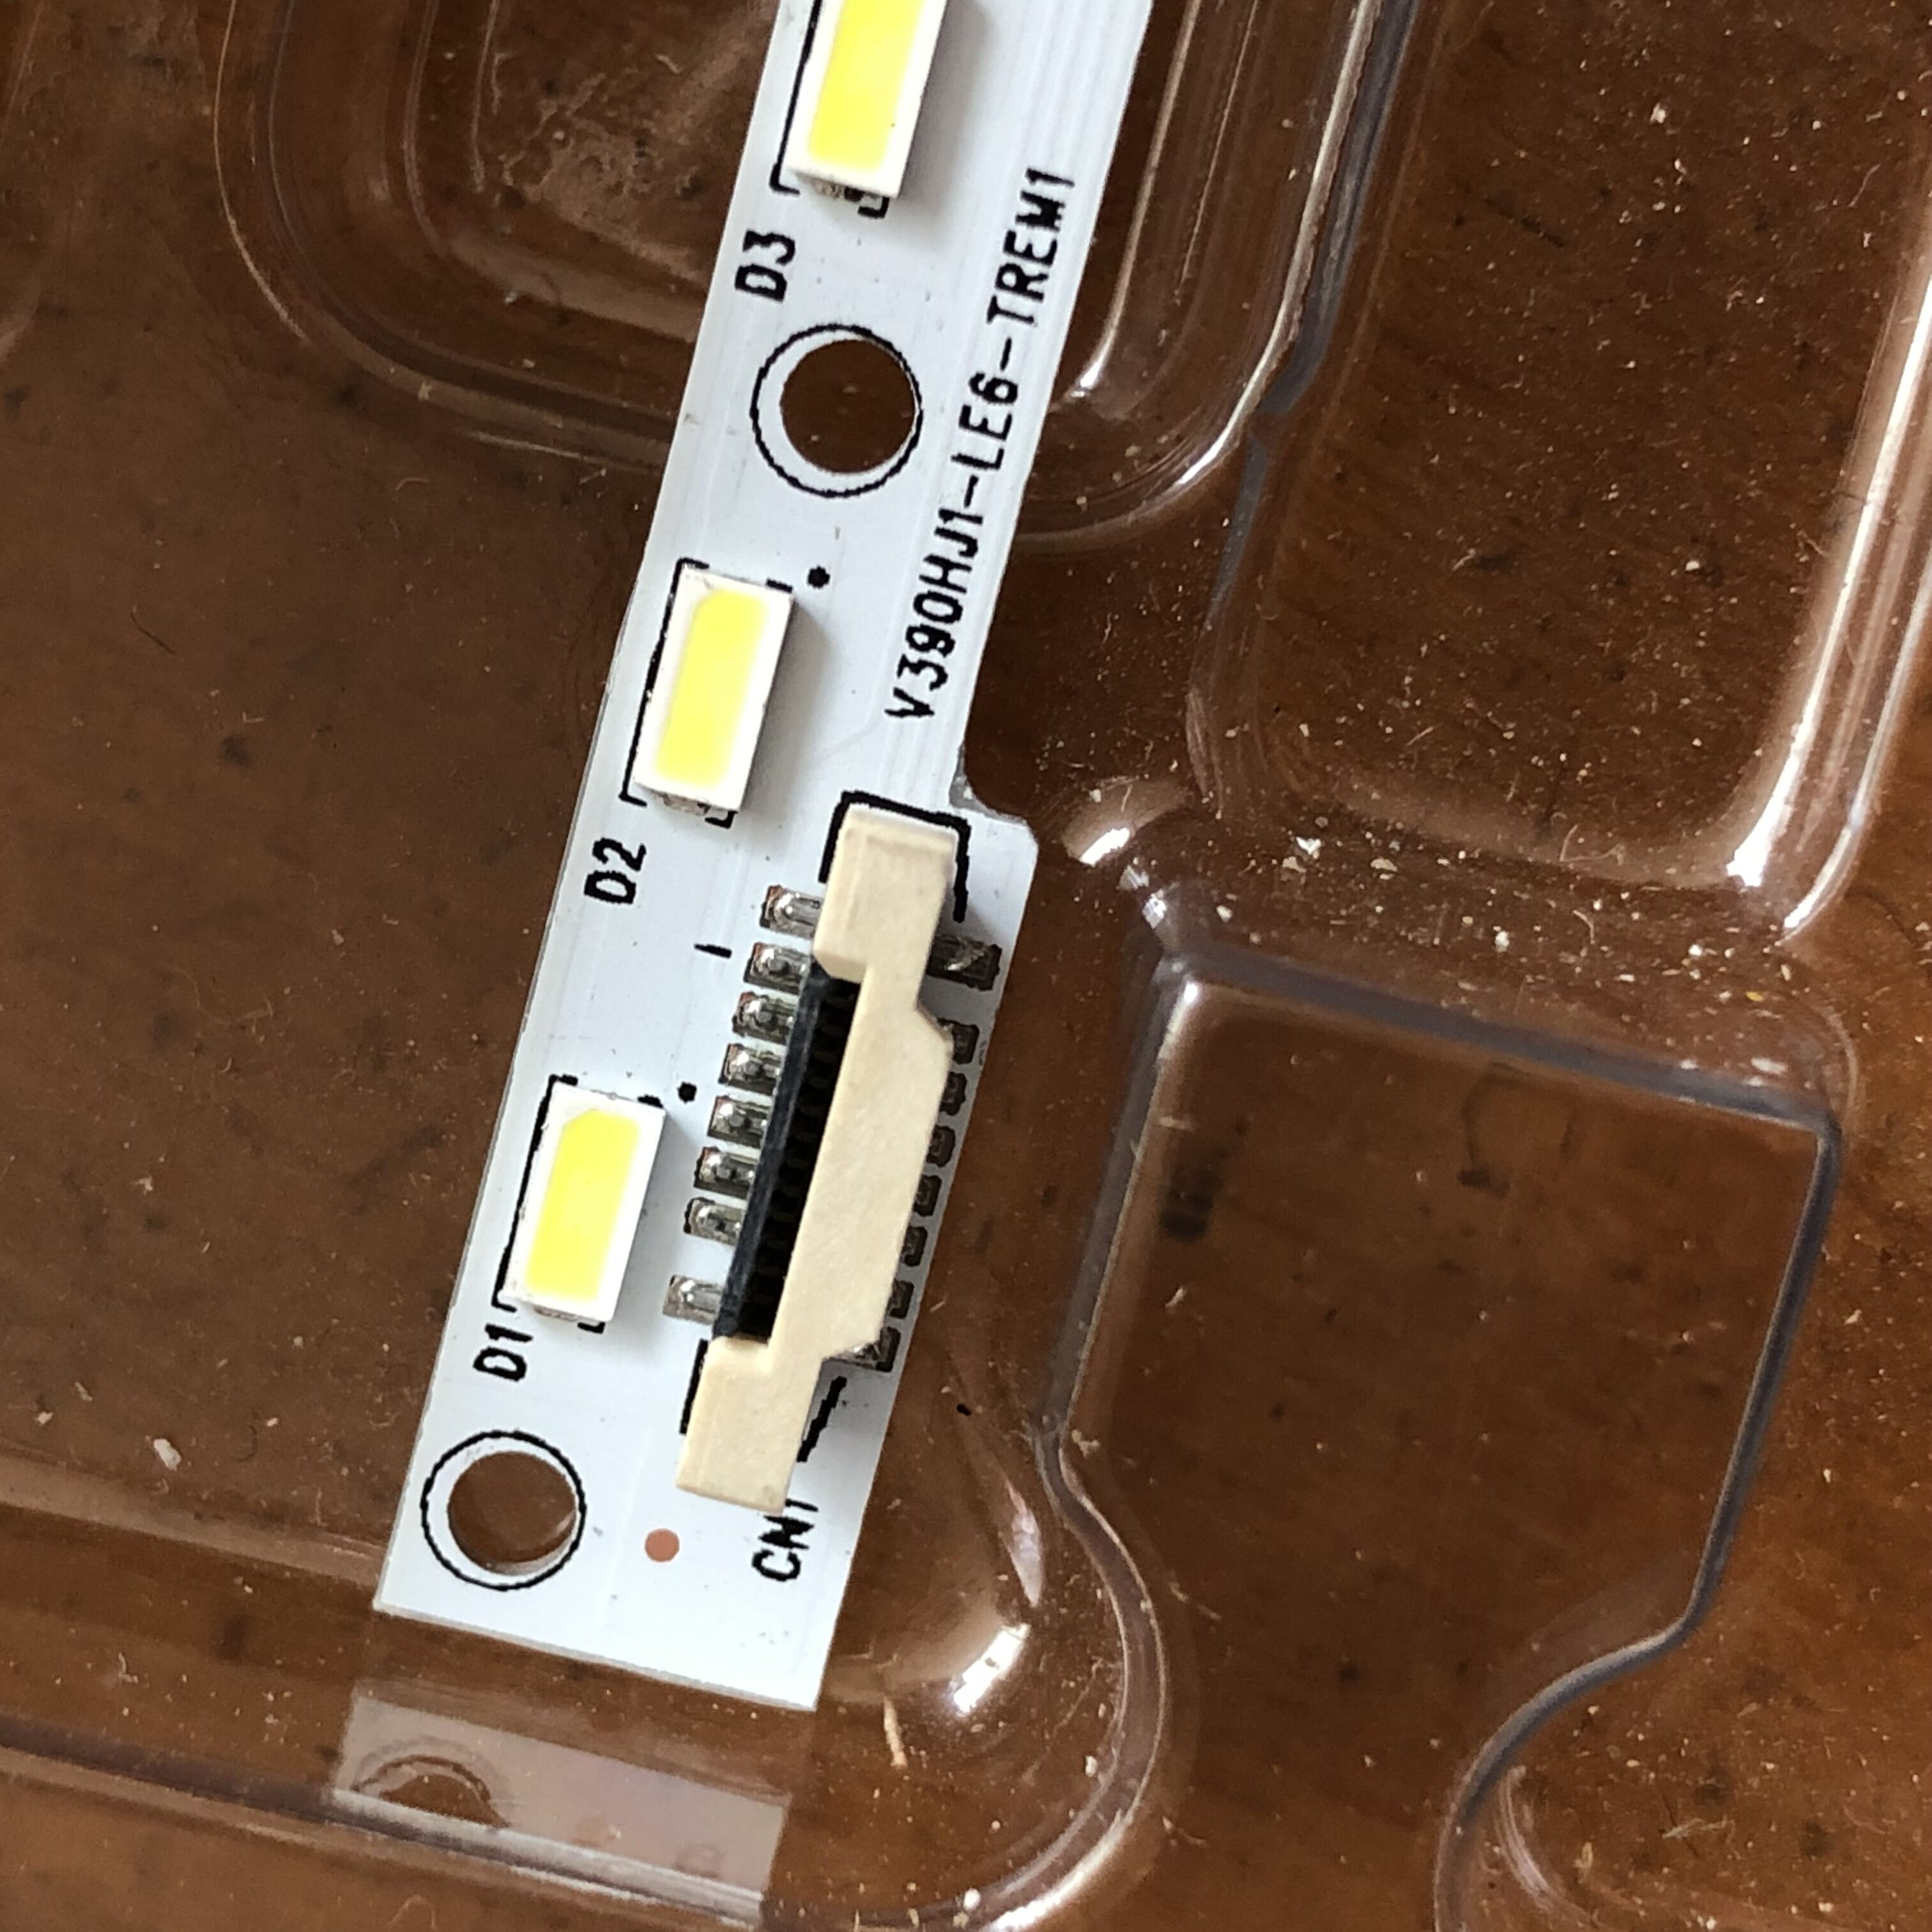 2Pieces/lot   V390HJ1-LE6-TREM1   Original Spot     48LED   490MM   100%NEW